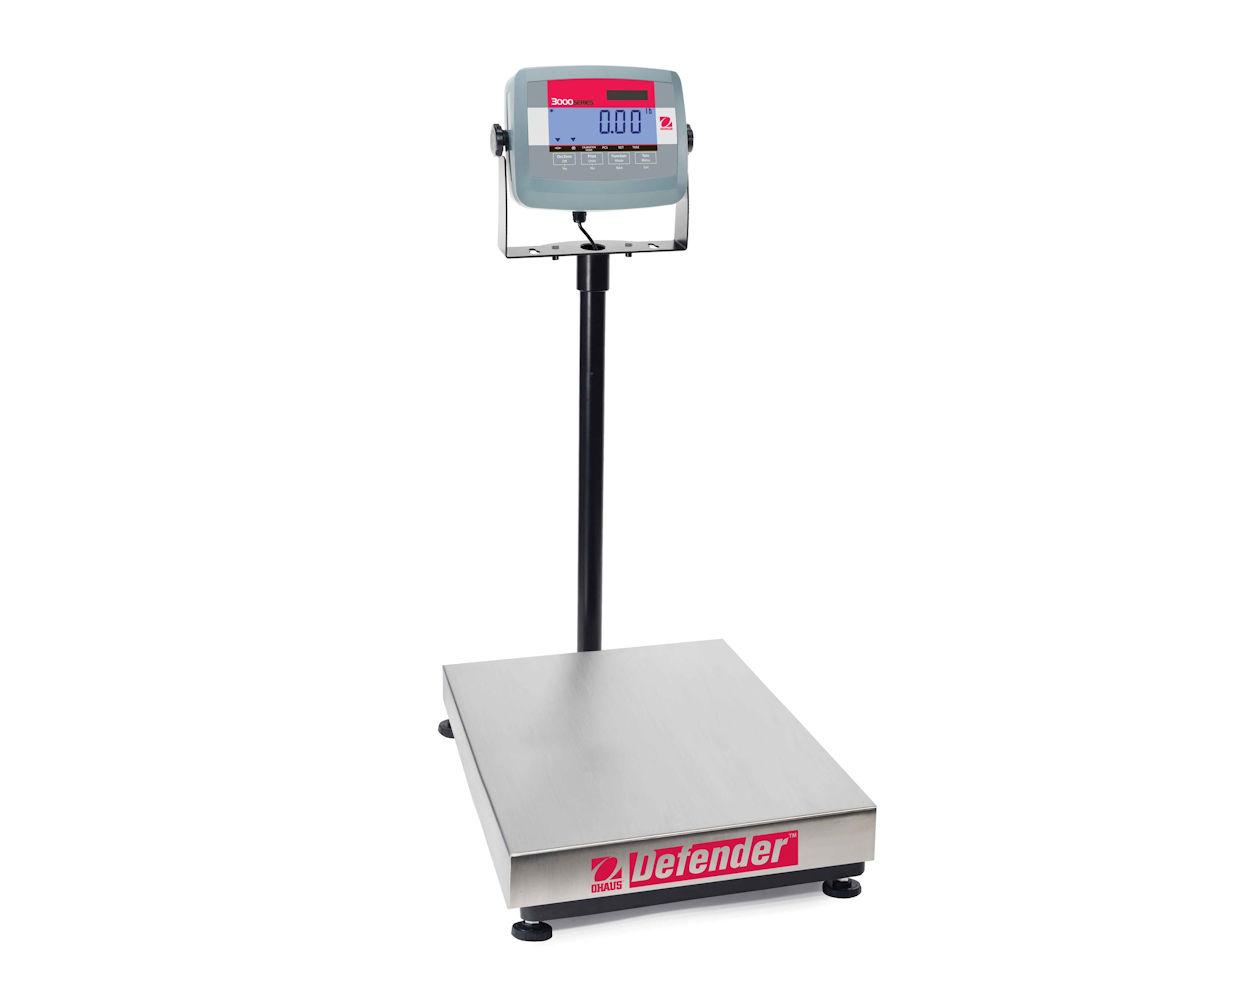 Ohaus Defender3000 kontrollvekt,  60kg/10g